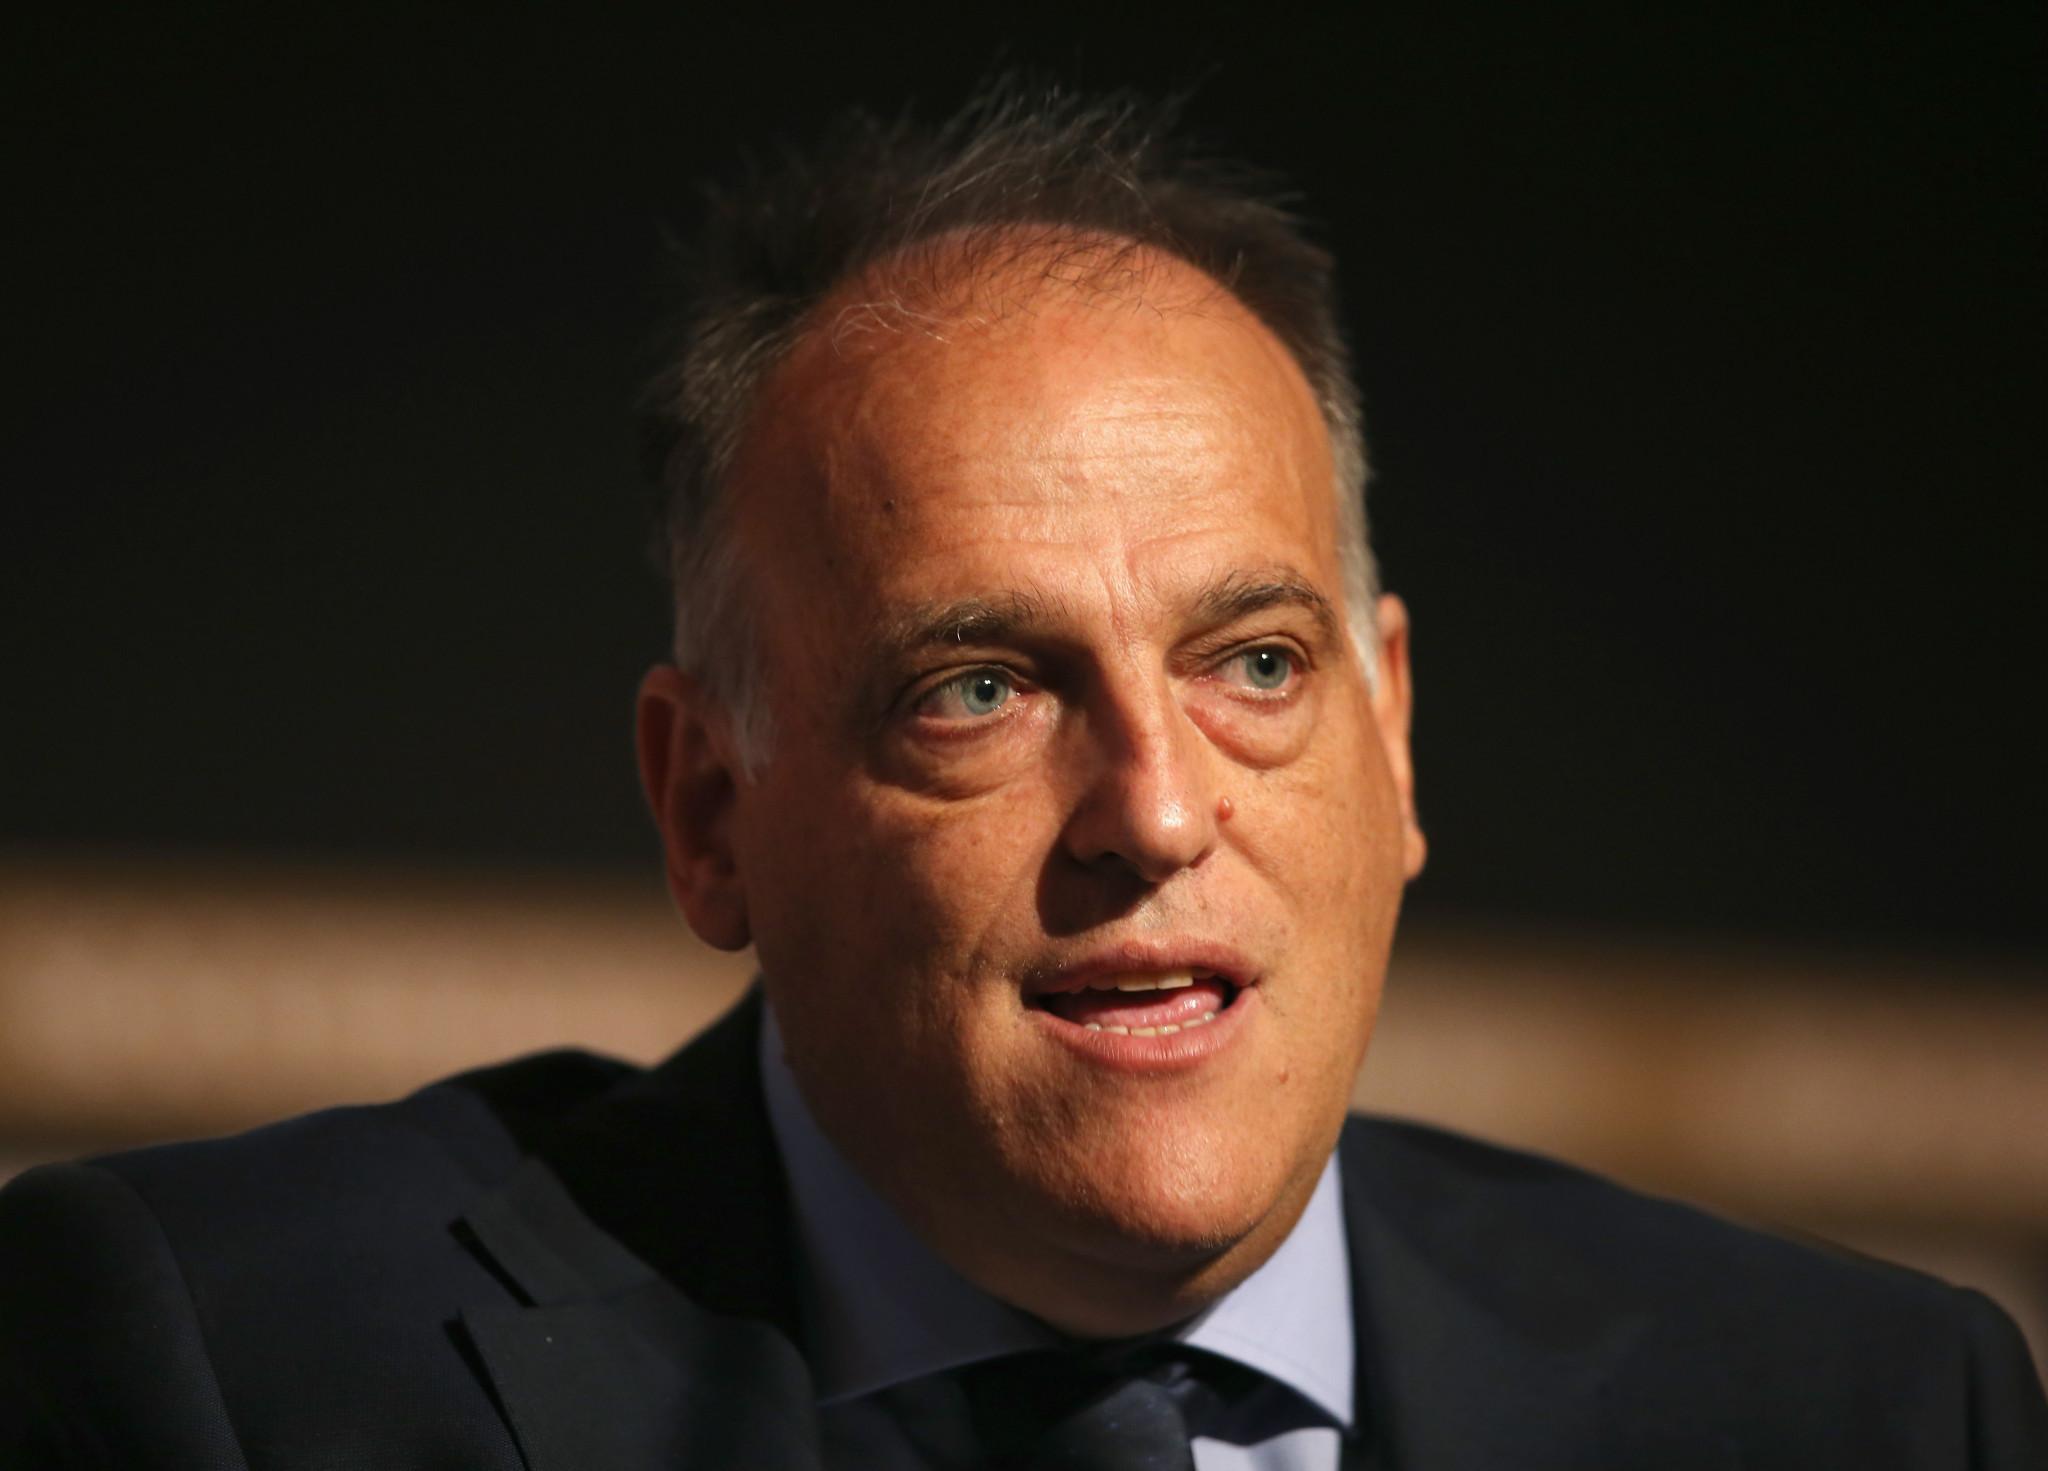 La Liga earmarking €18 million a year for other Spanish sports